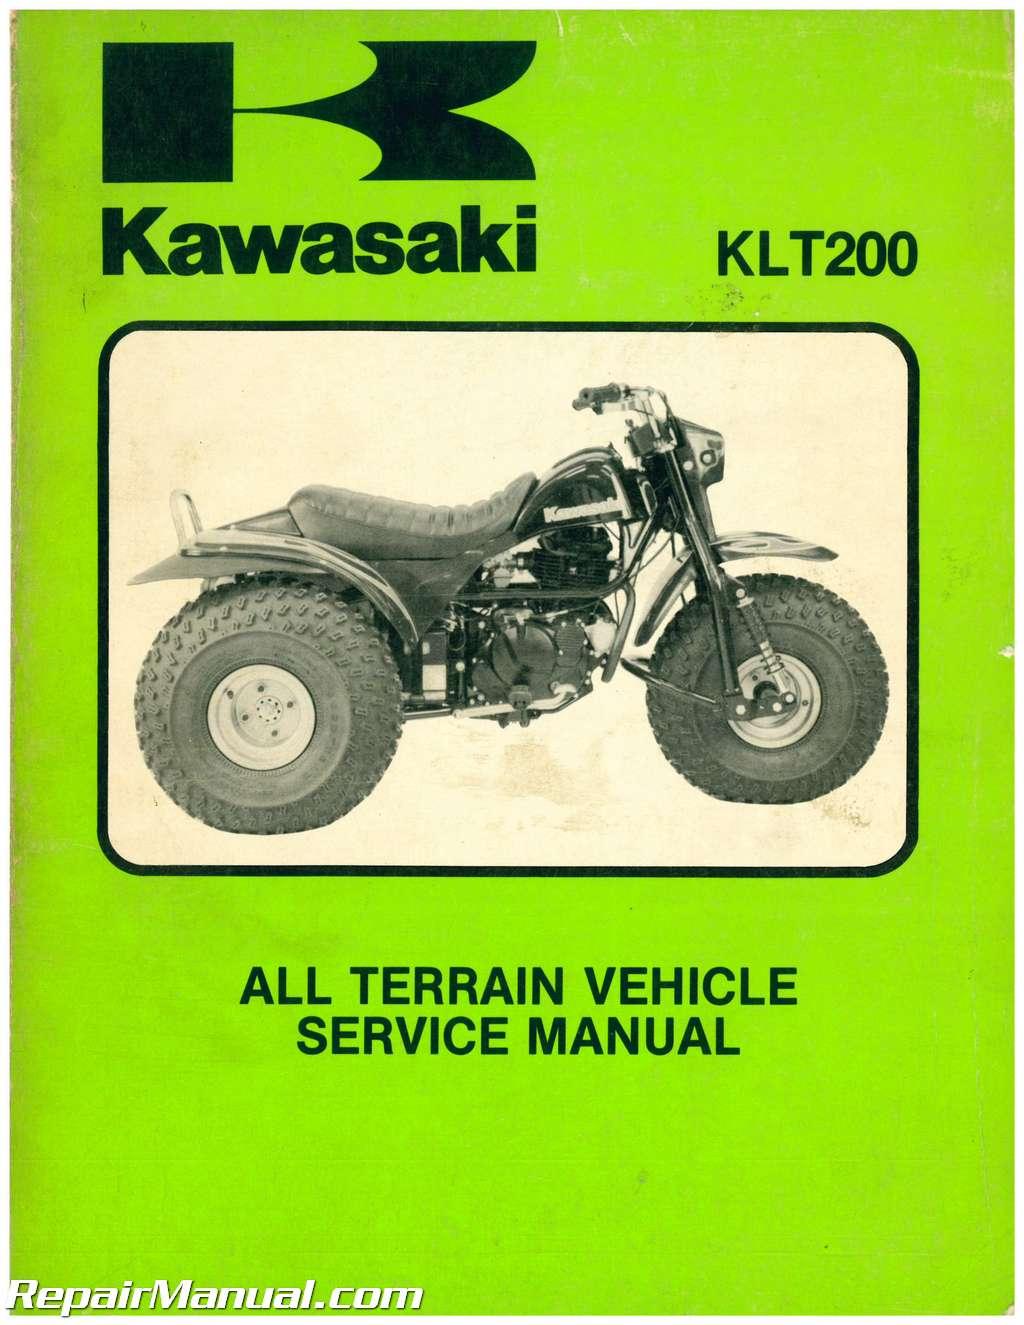 hight resolution of 1983 kawasaki klt200 atc three wheeler service manual